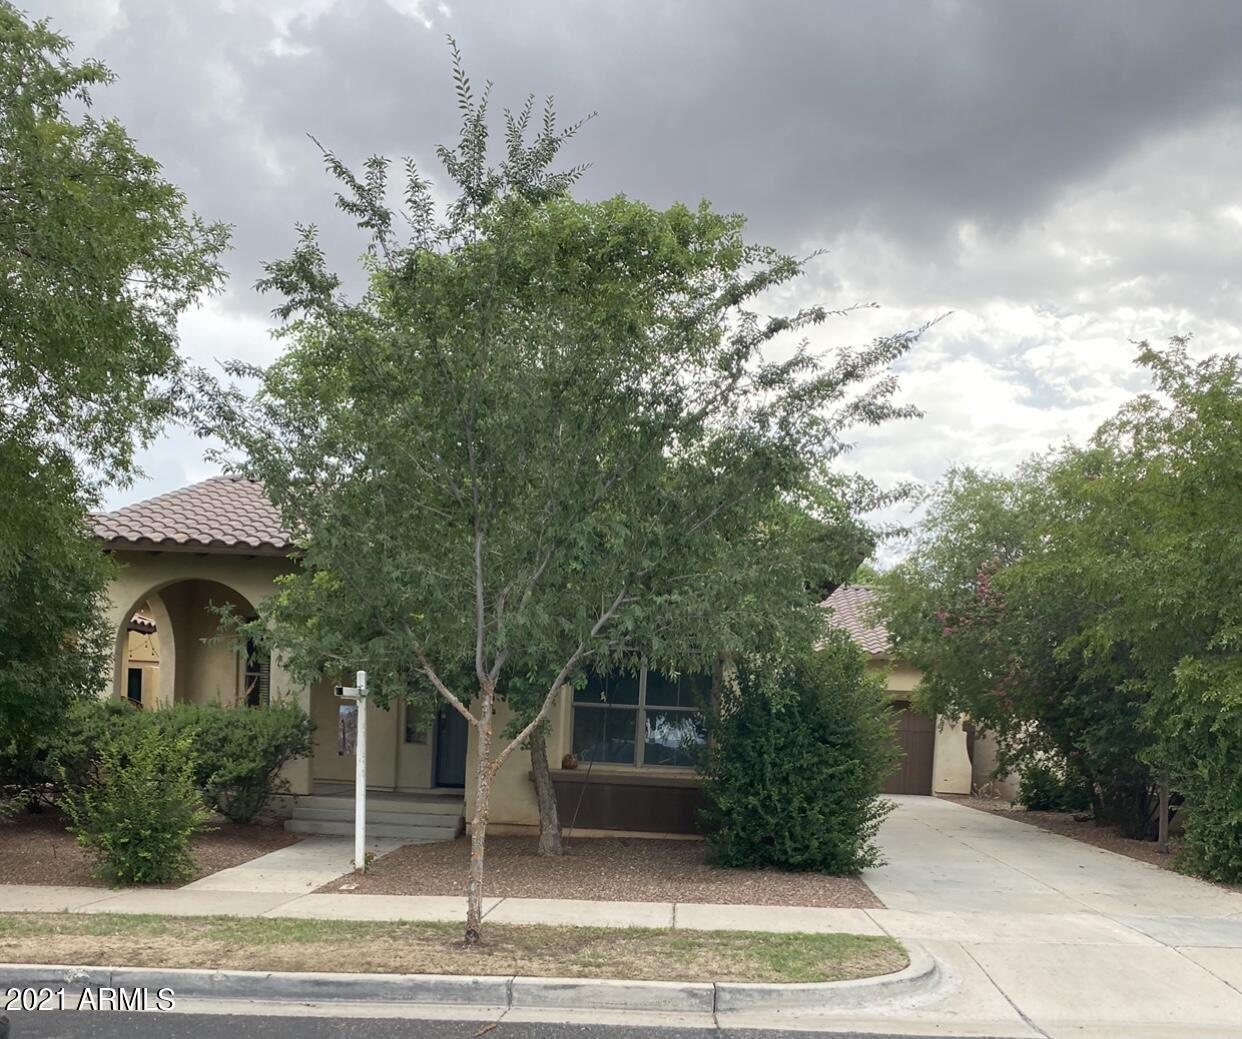 20793 W SENTINEL Drive, Buckeye, AZ 85396 - MLS#: 6244324